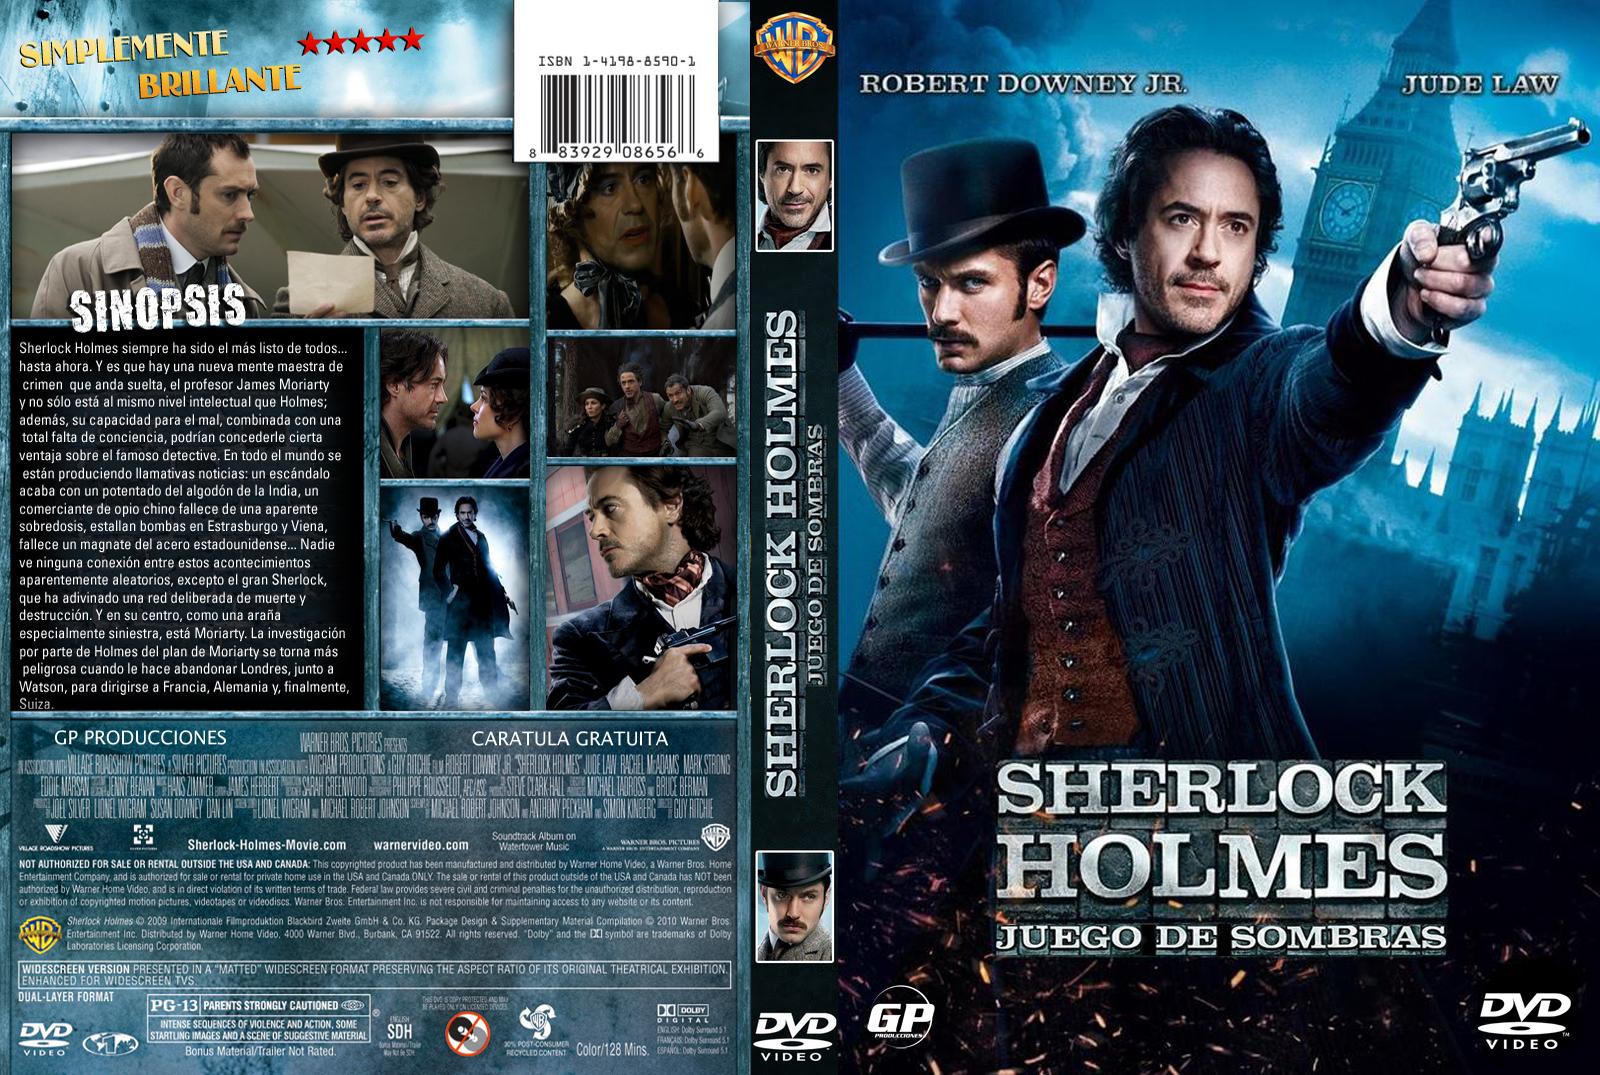 Sherlock holmes la boucle dargent